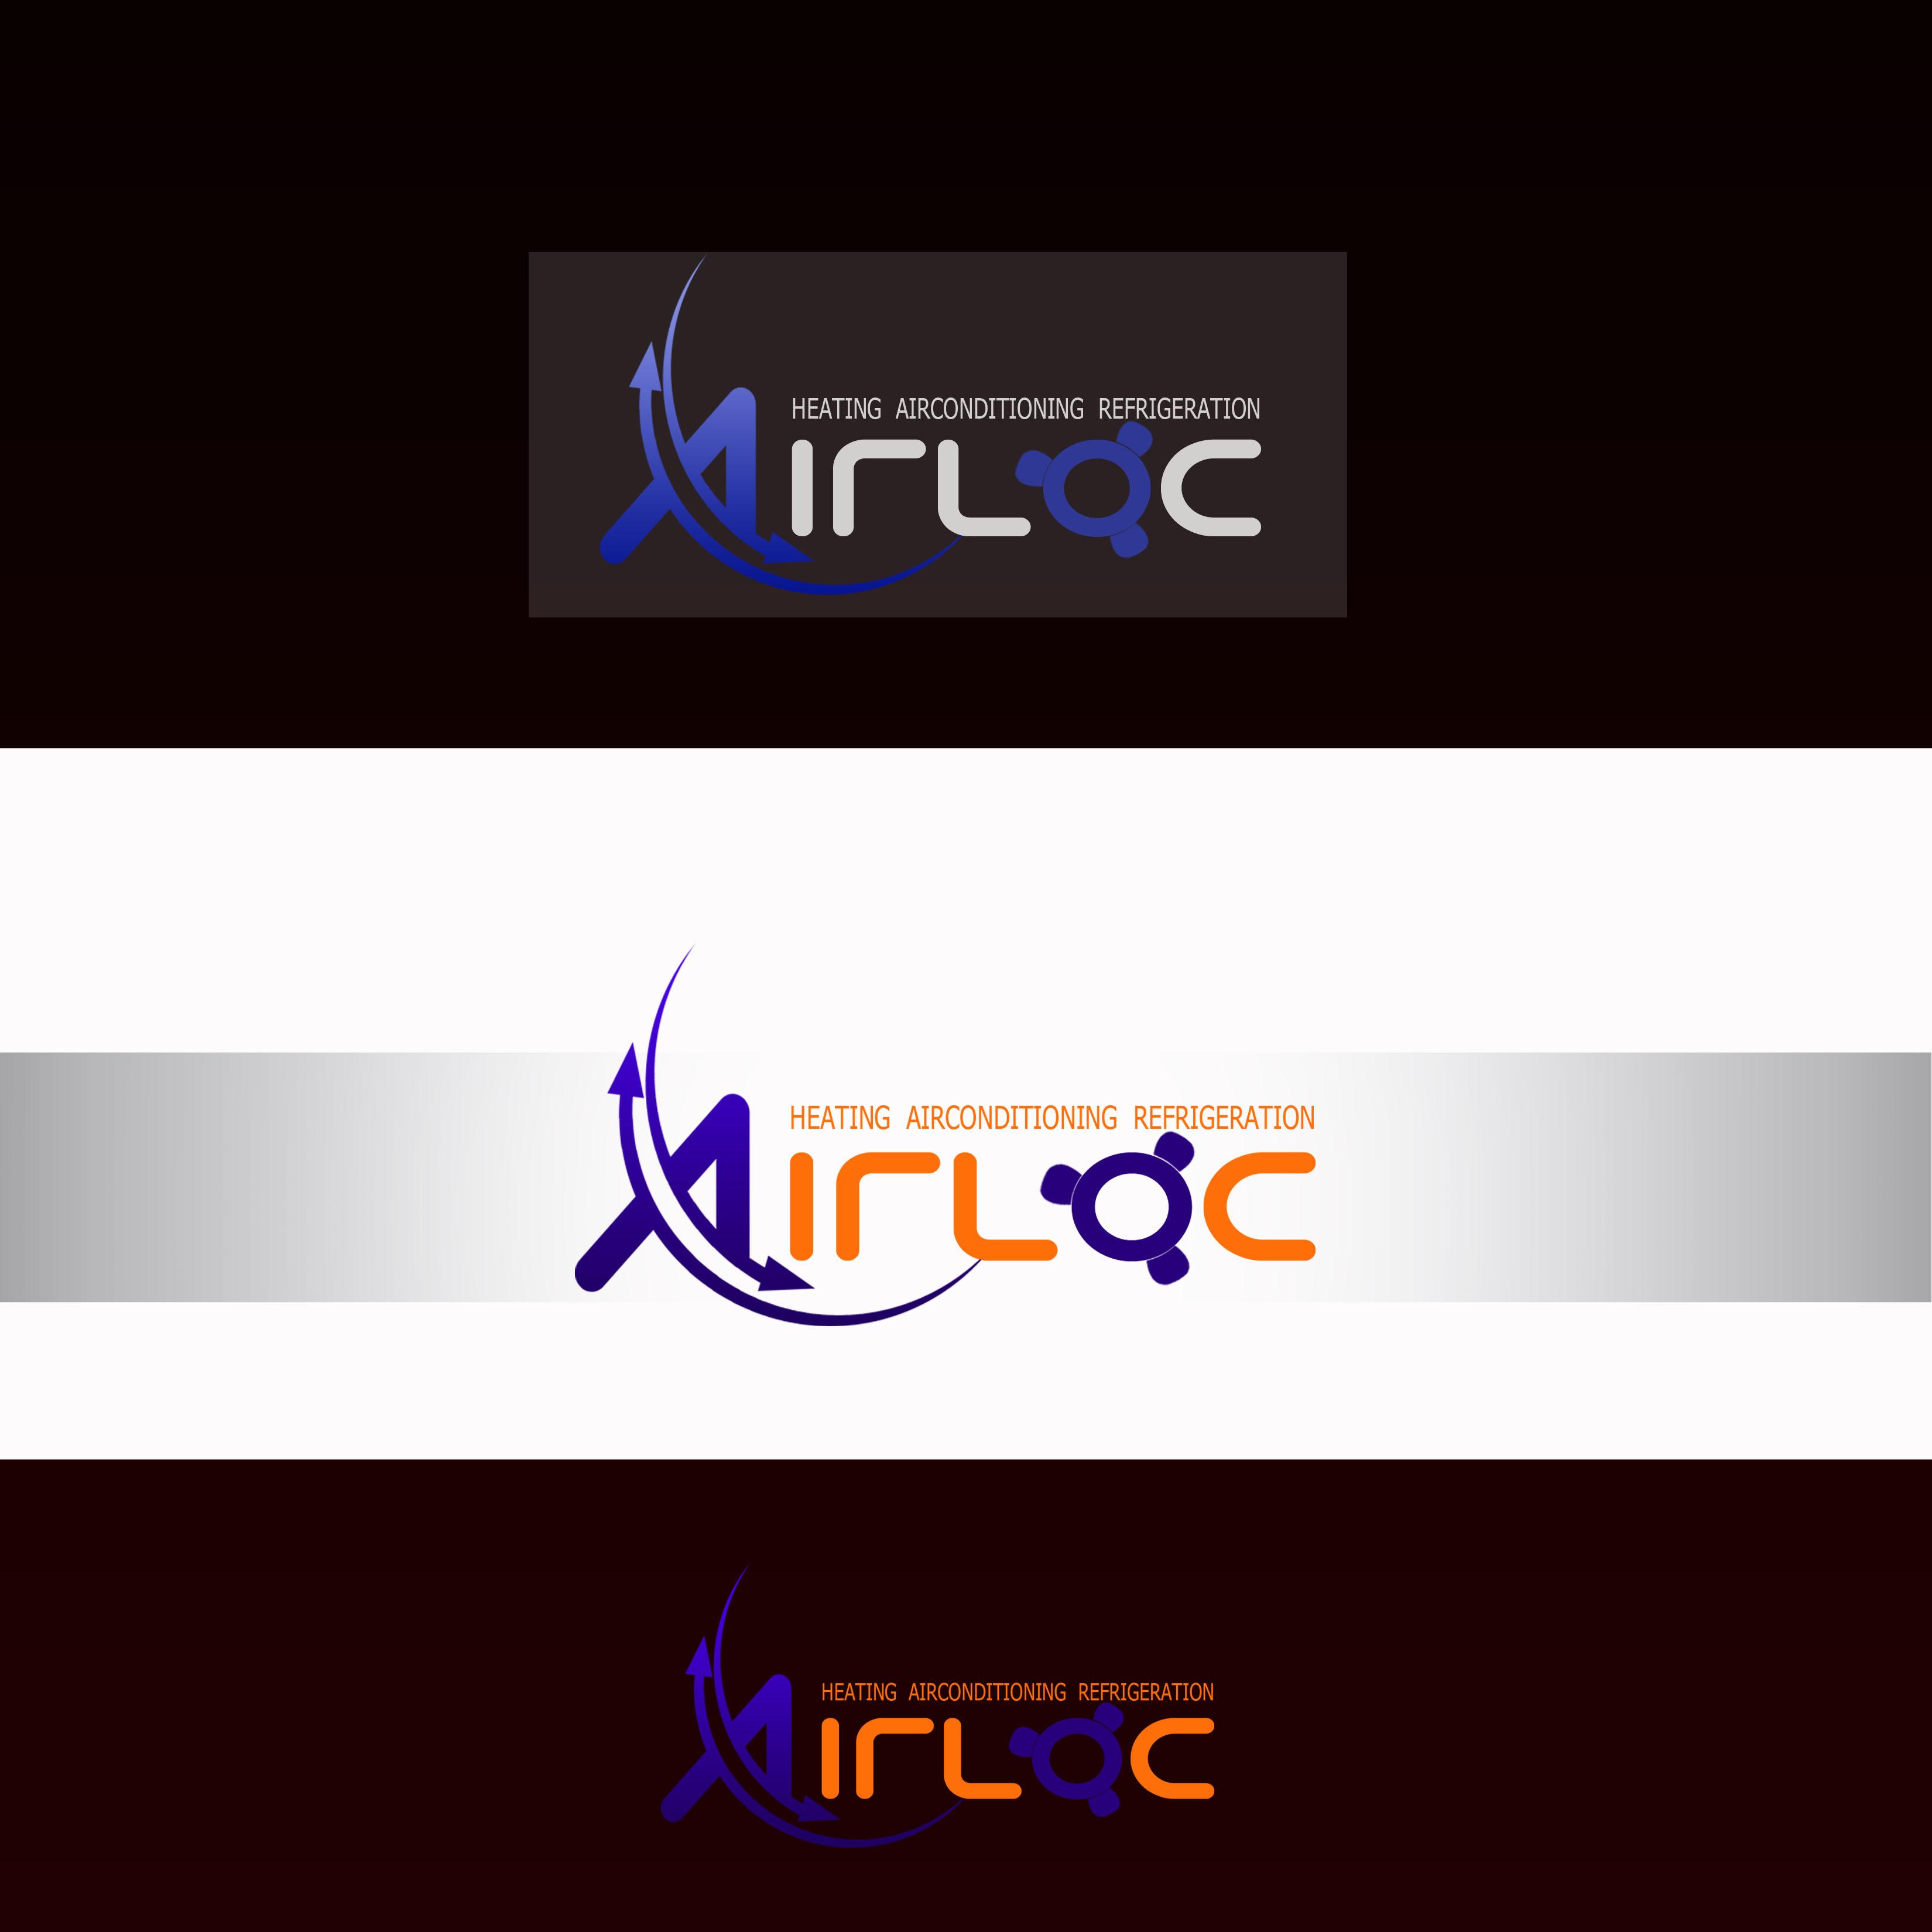 Logo Design by Allan Esclamado - Entry No. 8 in the Logo Design Contest Airloc Logo Design.